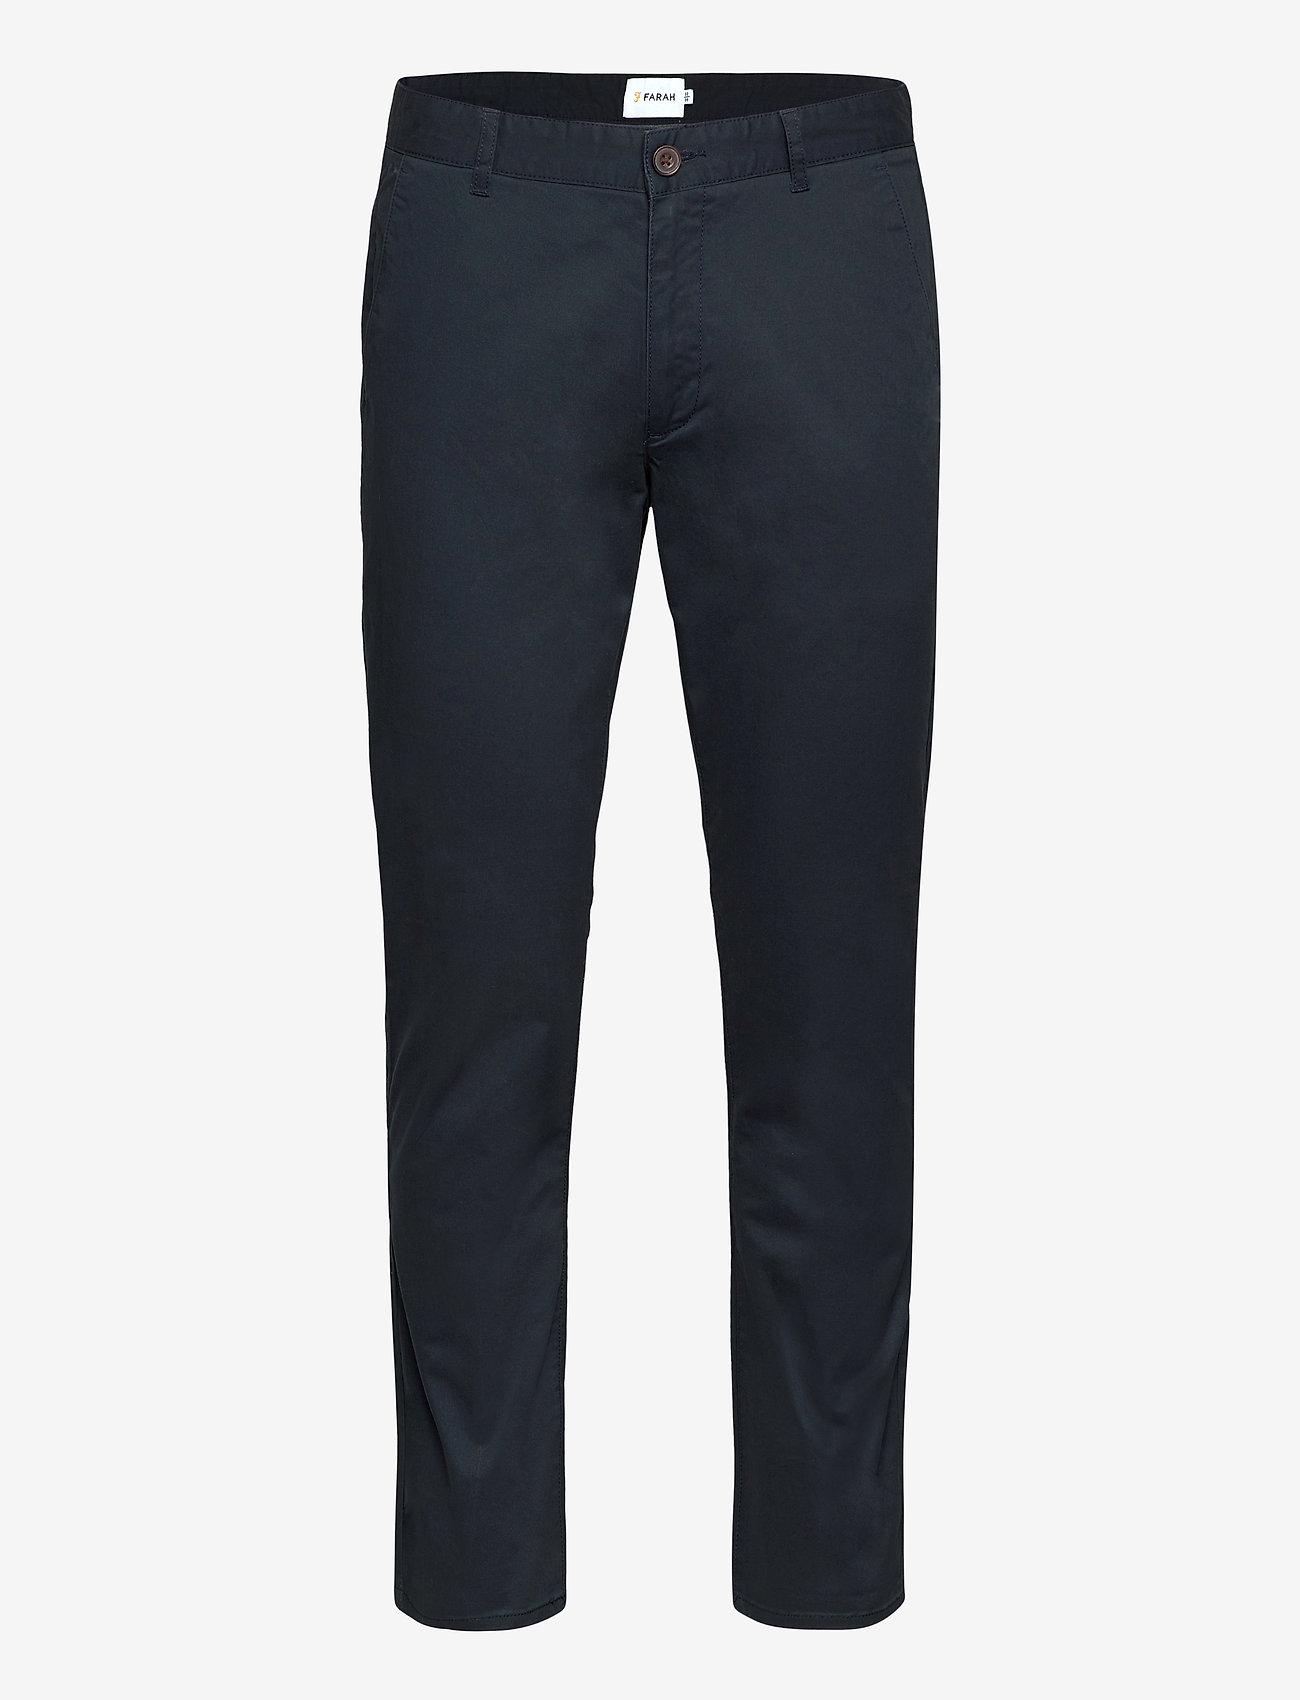 Farah - ELM TWILL CHINO - pantalons chino - true navy - 0